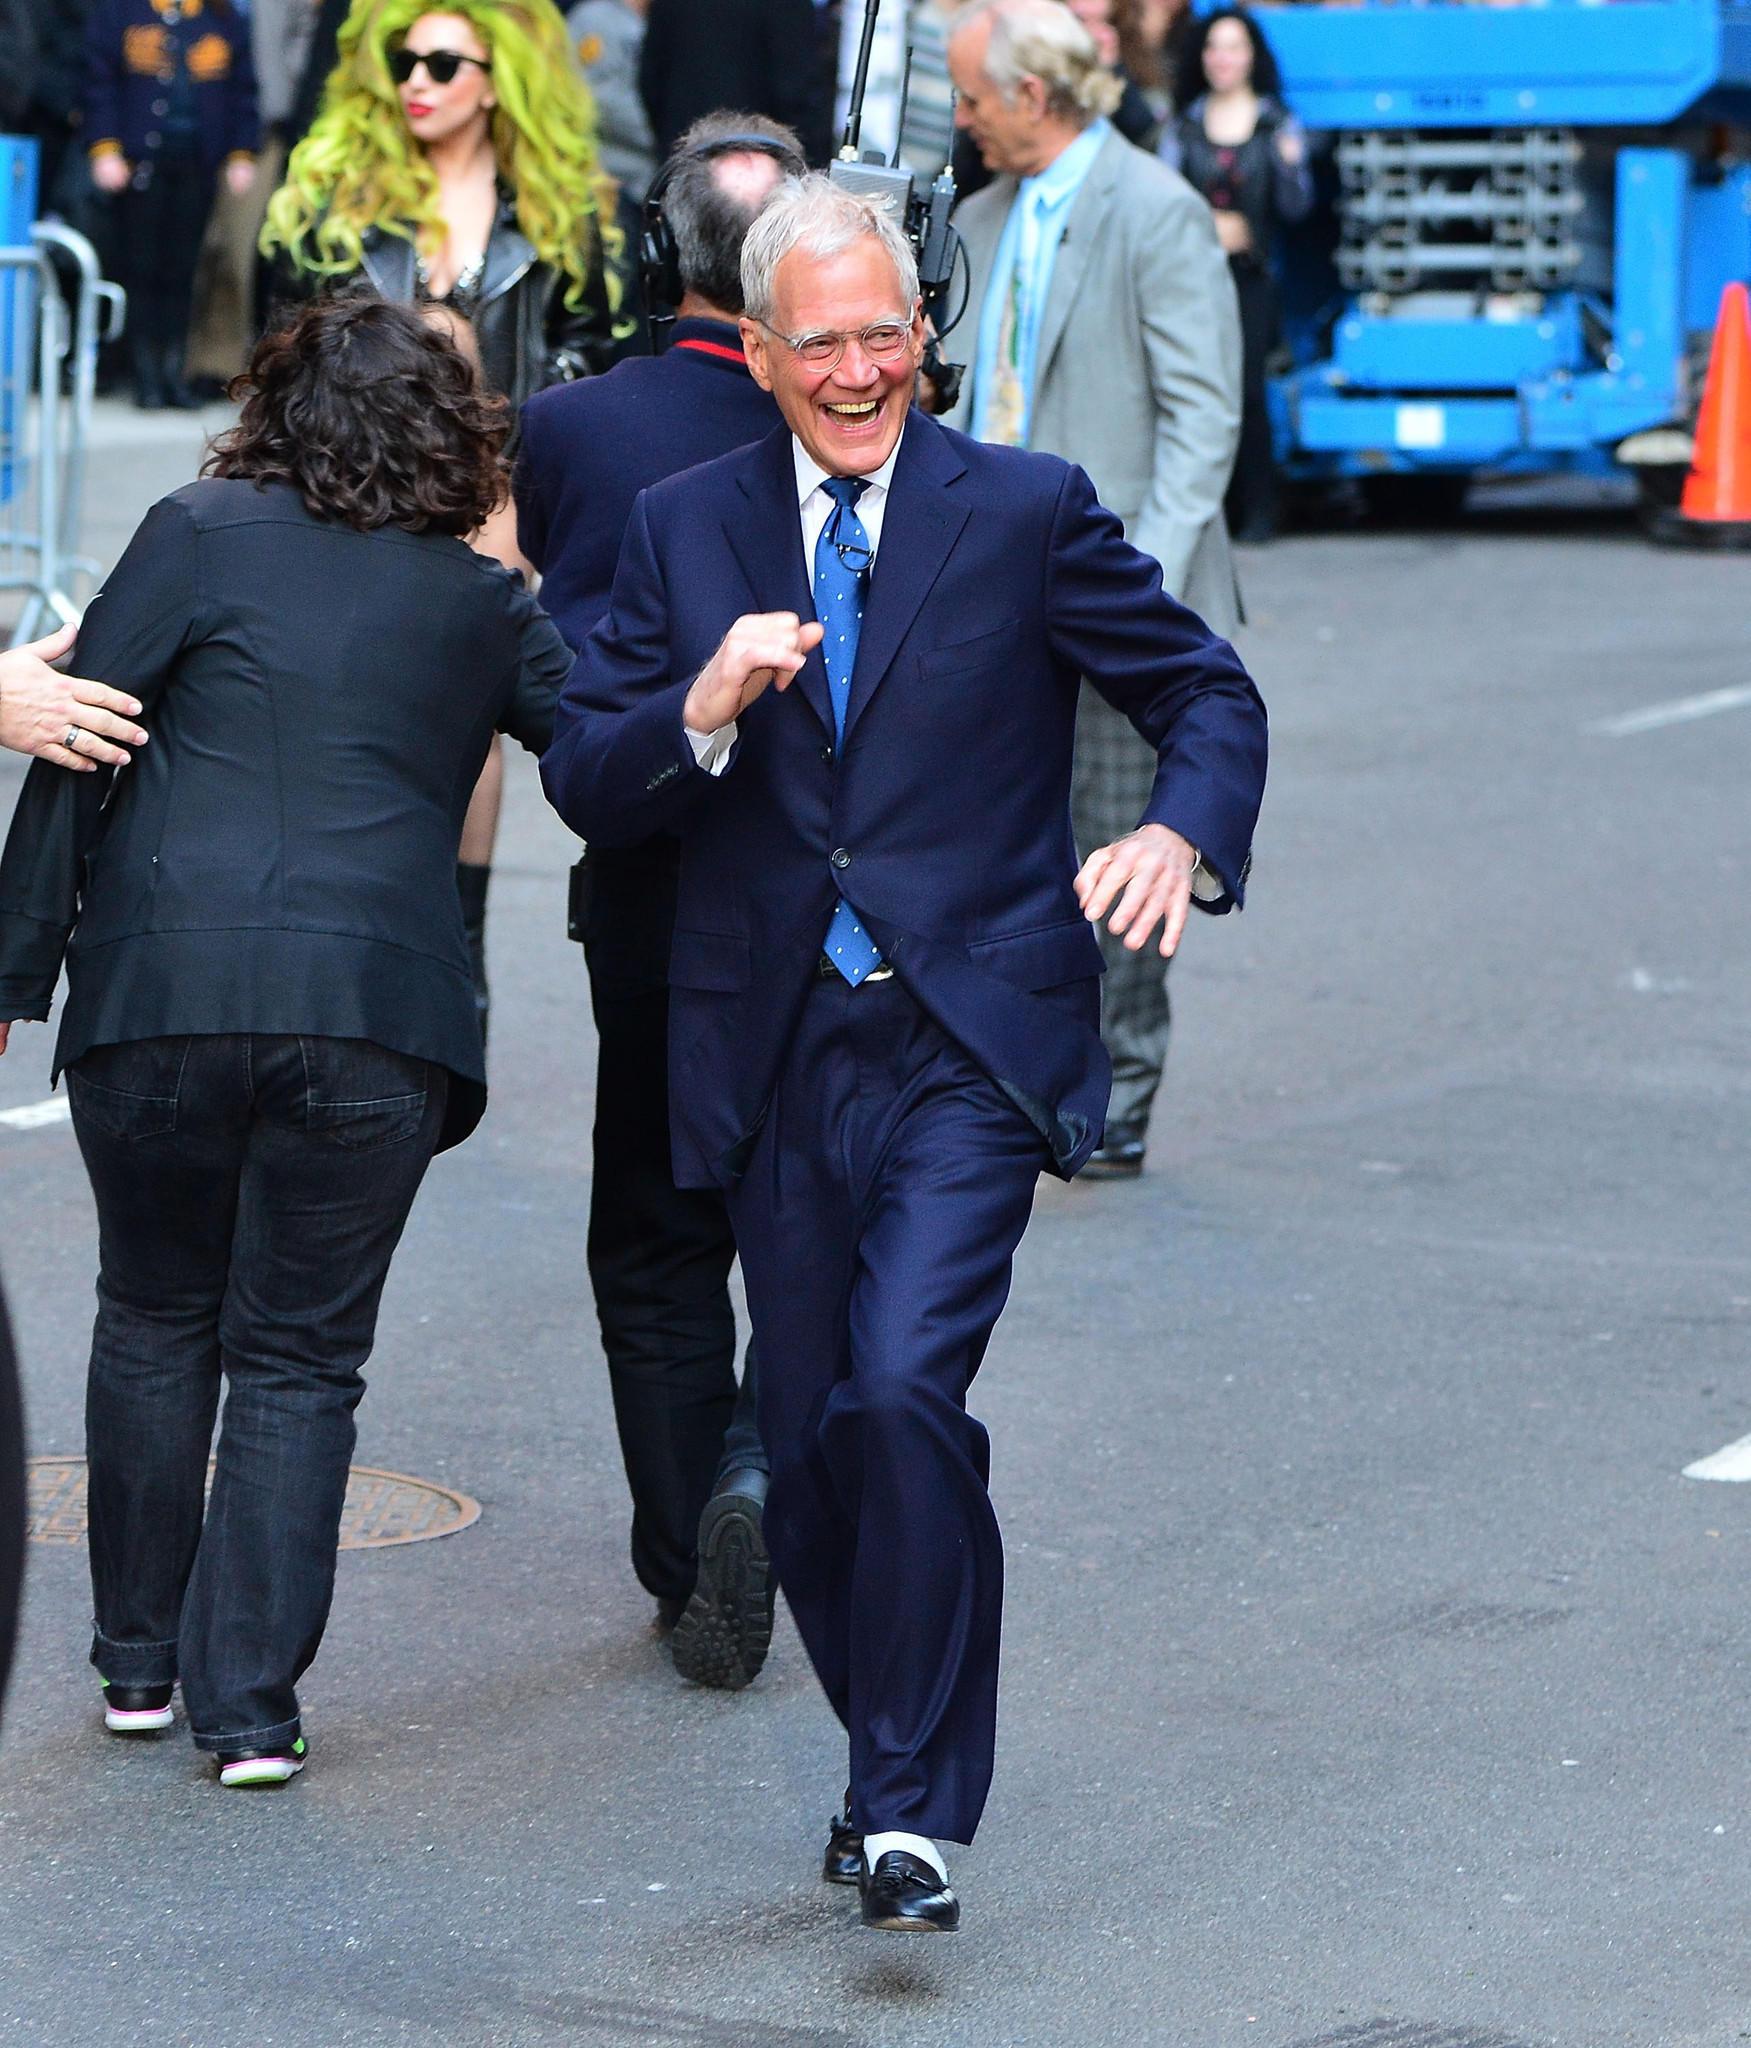 David Letterman arrives at Roseland Ballroom in New York City.